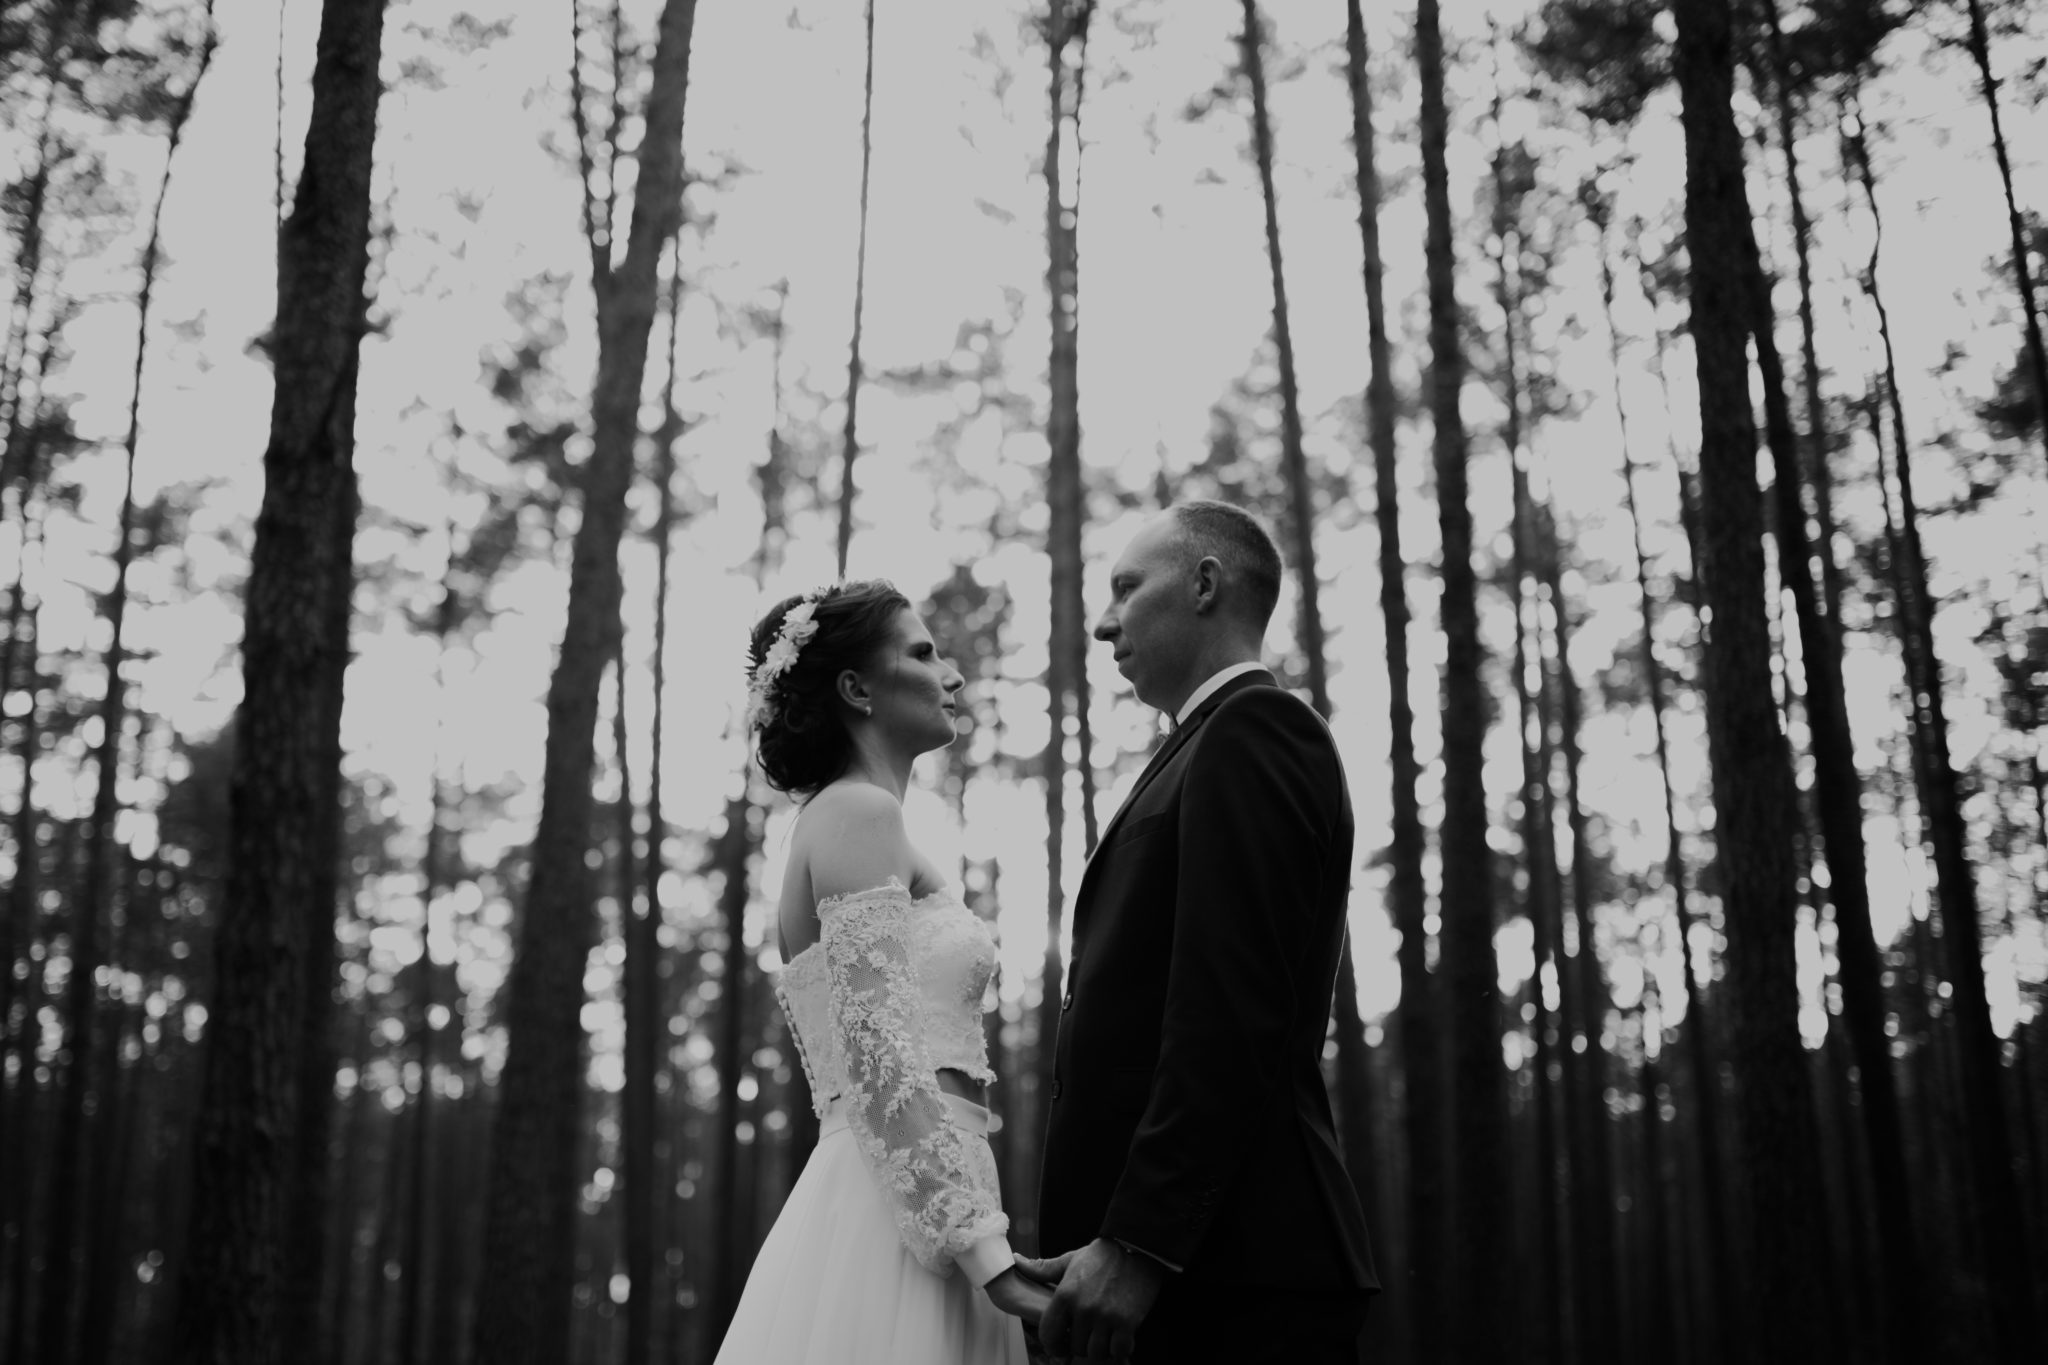 gosia i kubaplener 7 1 - fotografiagk Fotografia ślubna RK wedding